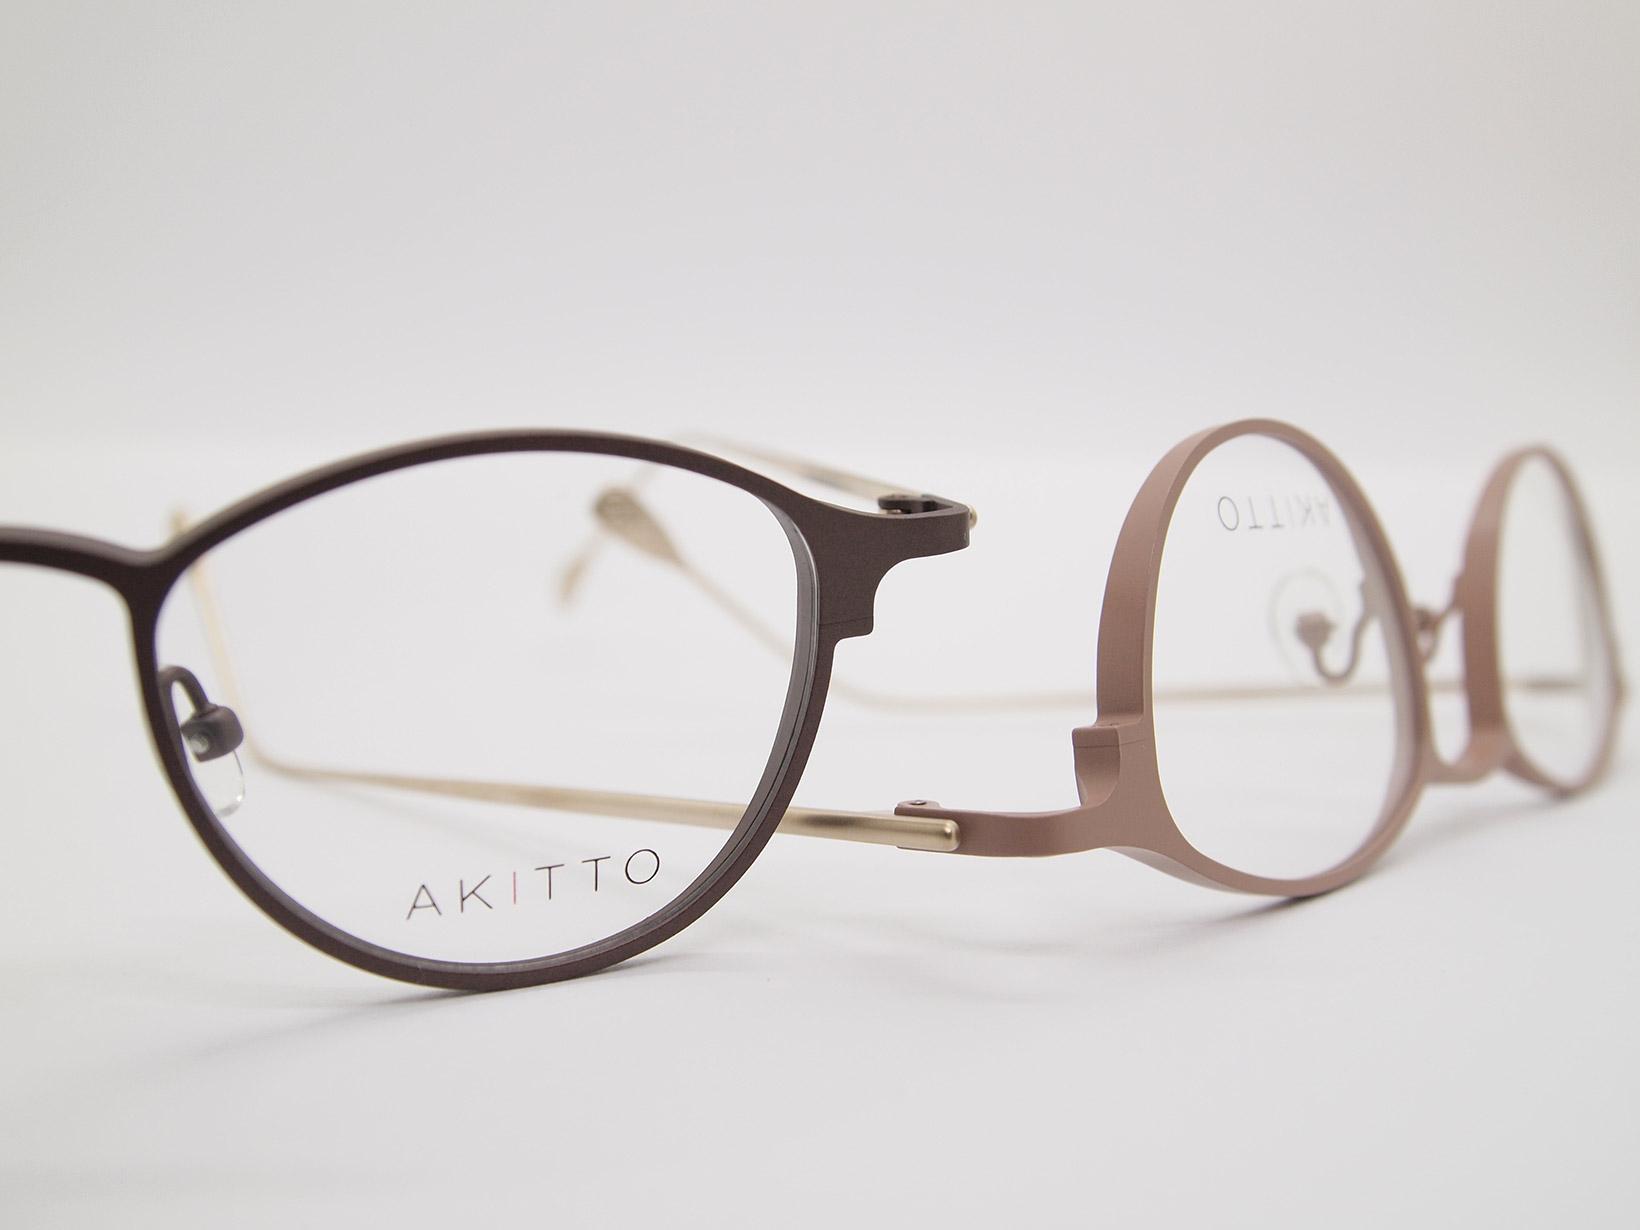 AKITTO 2021-4th lat size:45□20 material:titanium price:¥46,200-(税込み)